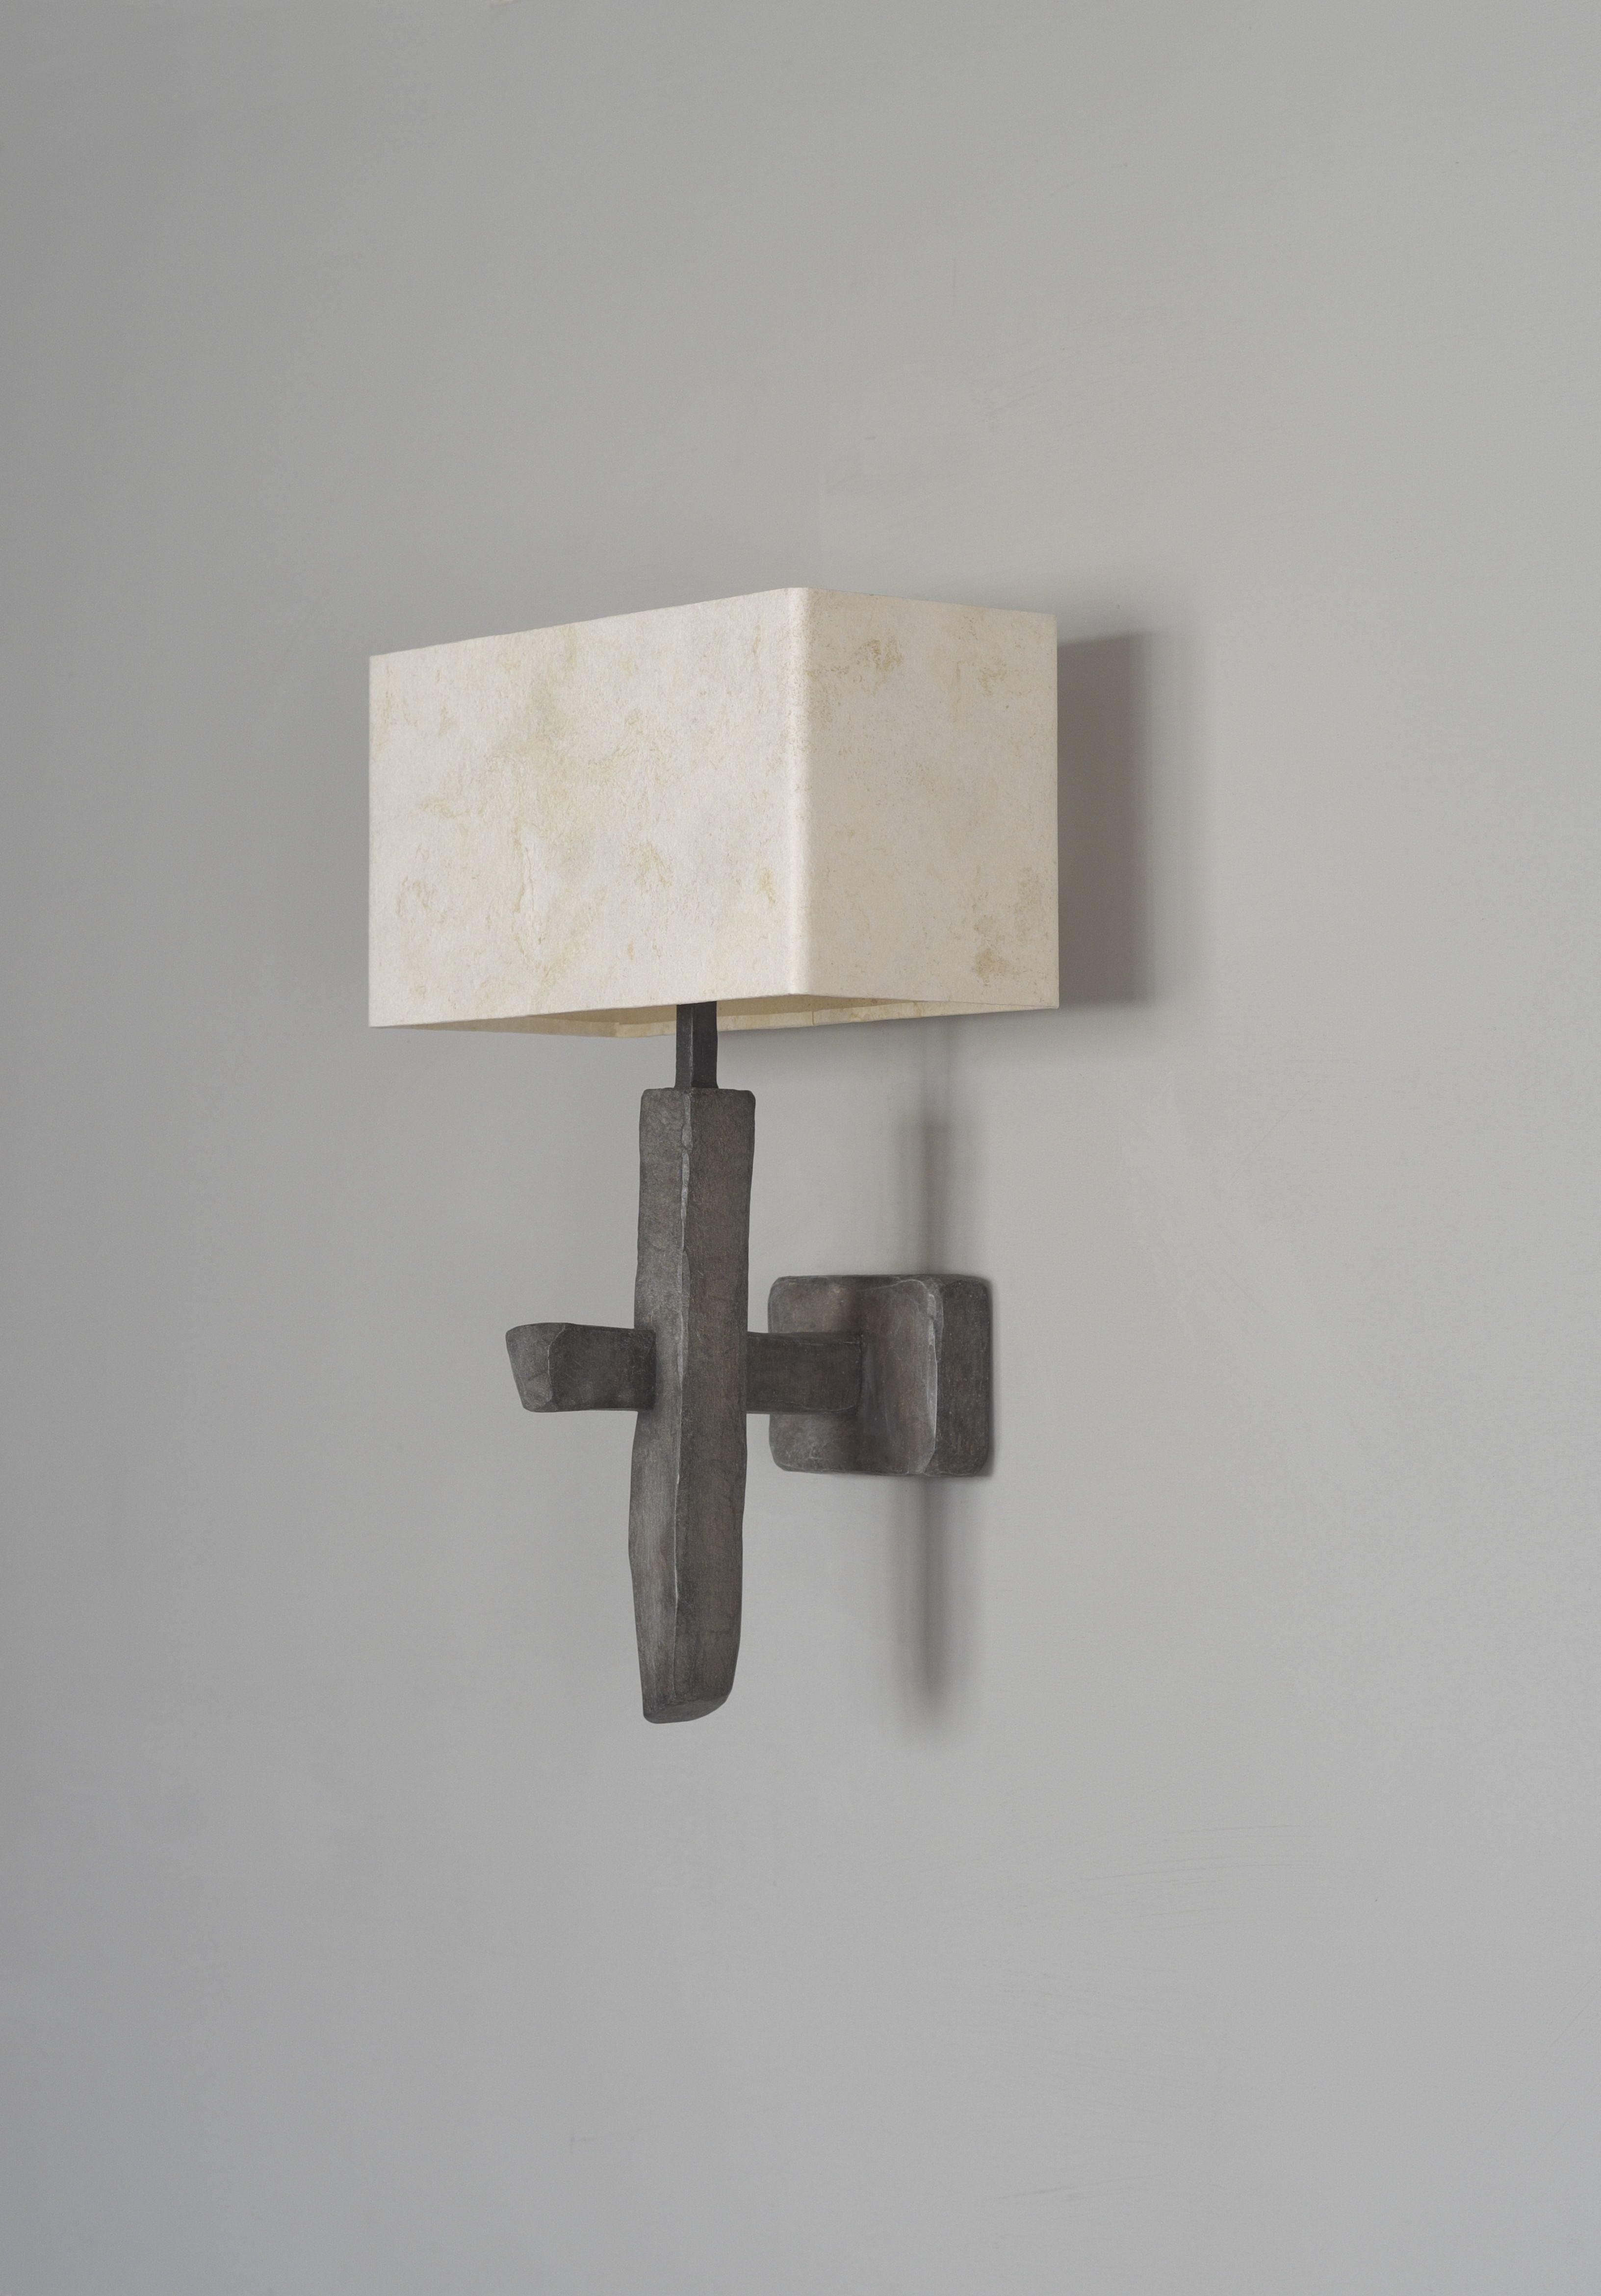 Single criss cross wall light lamps 燈具 pinterest cross walls